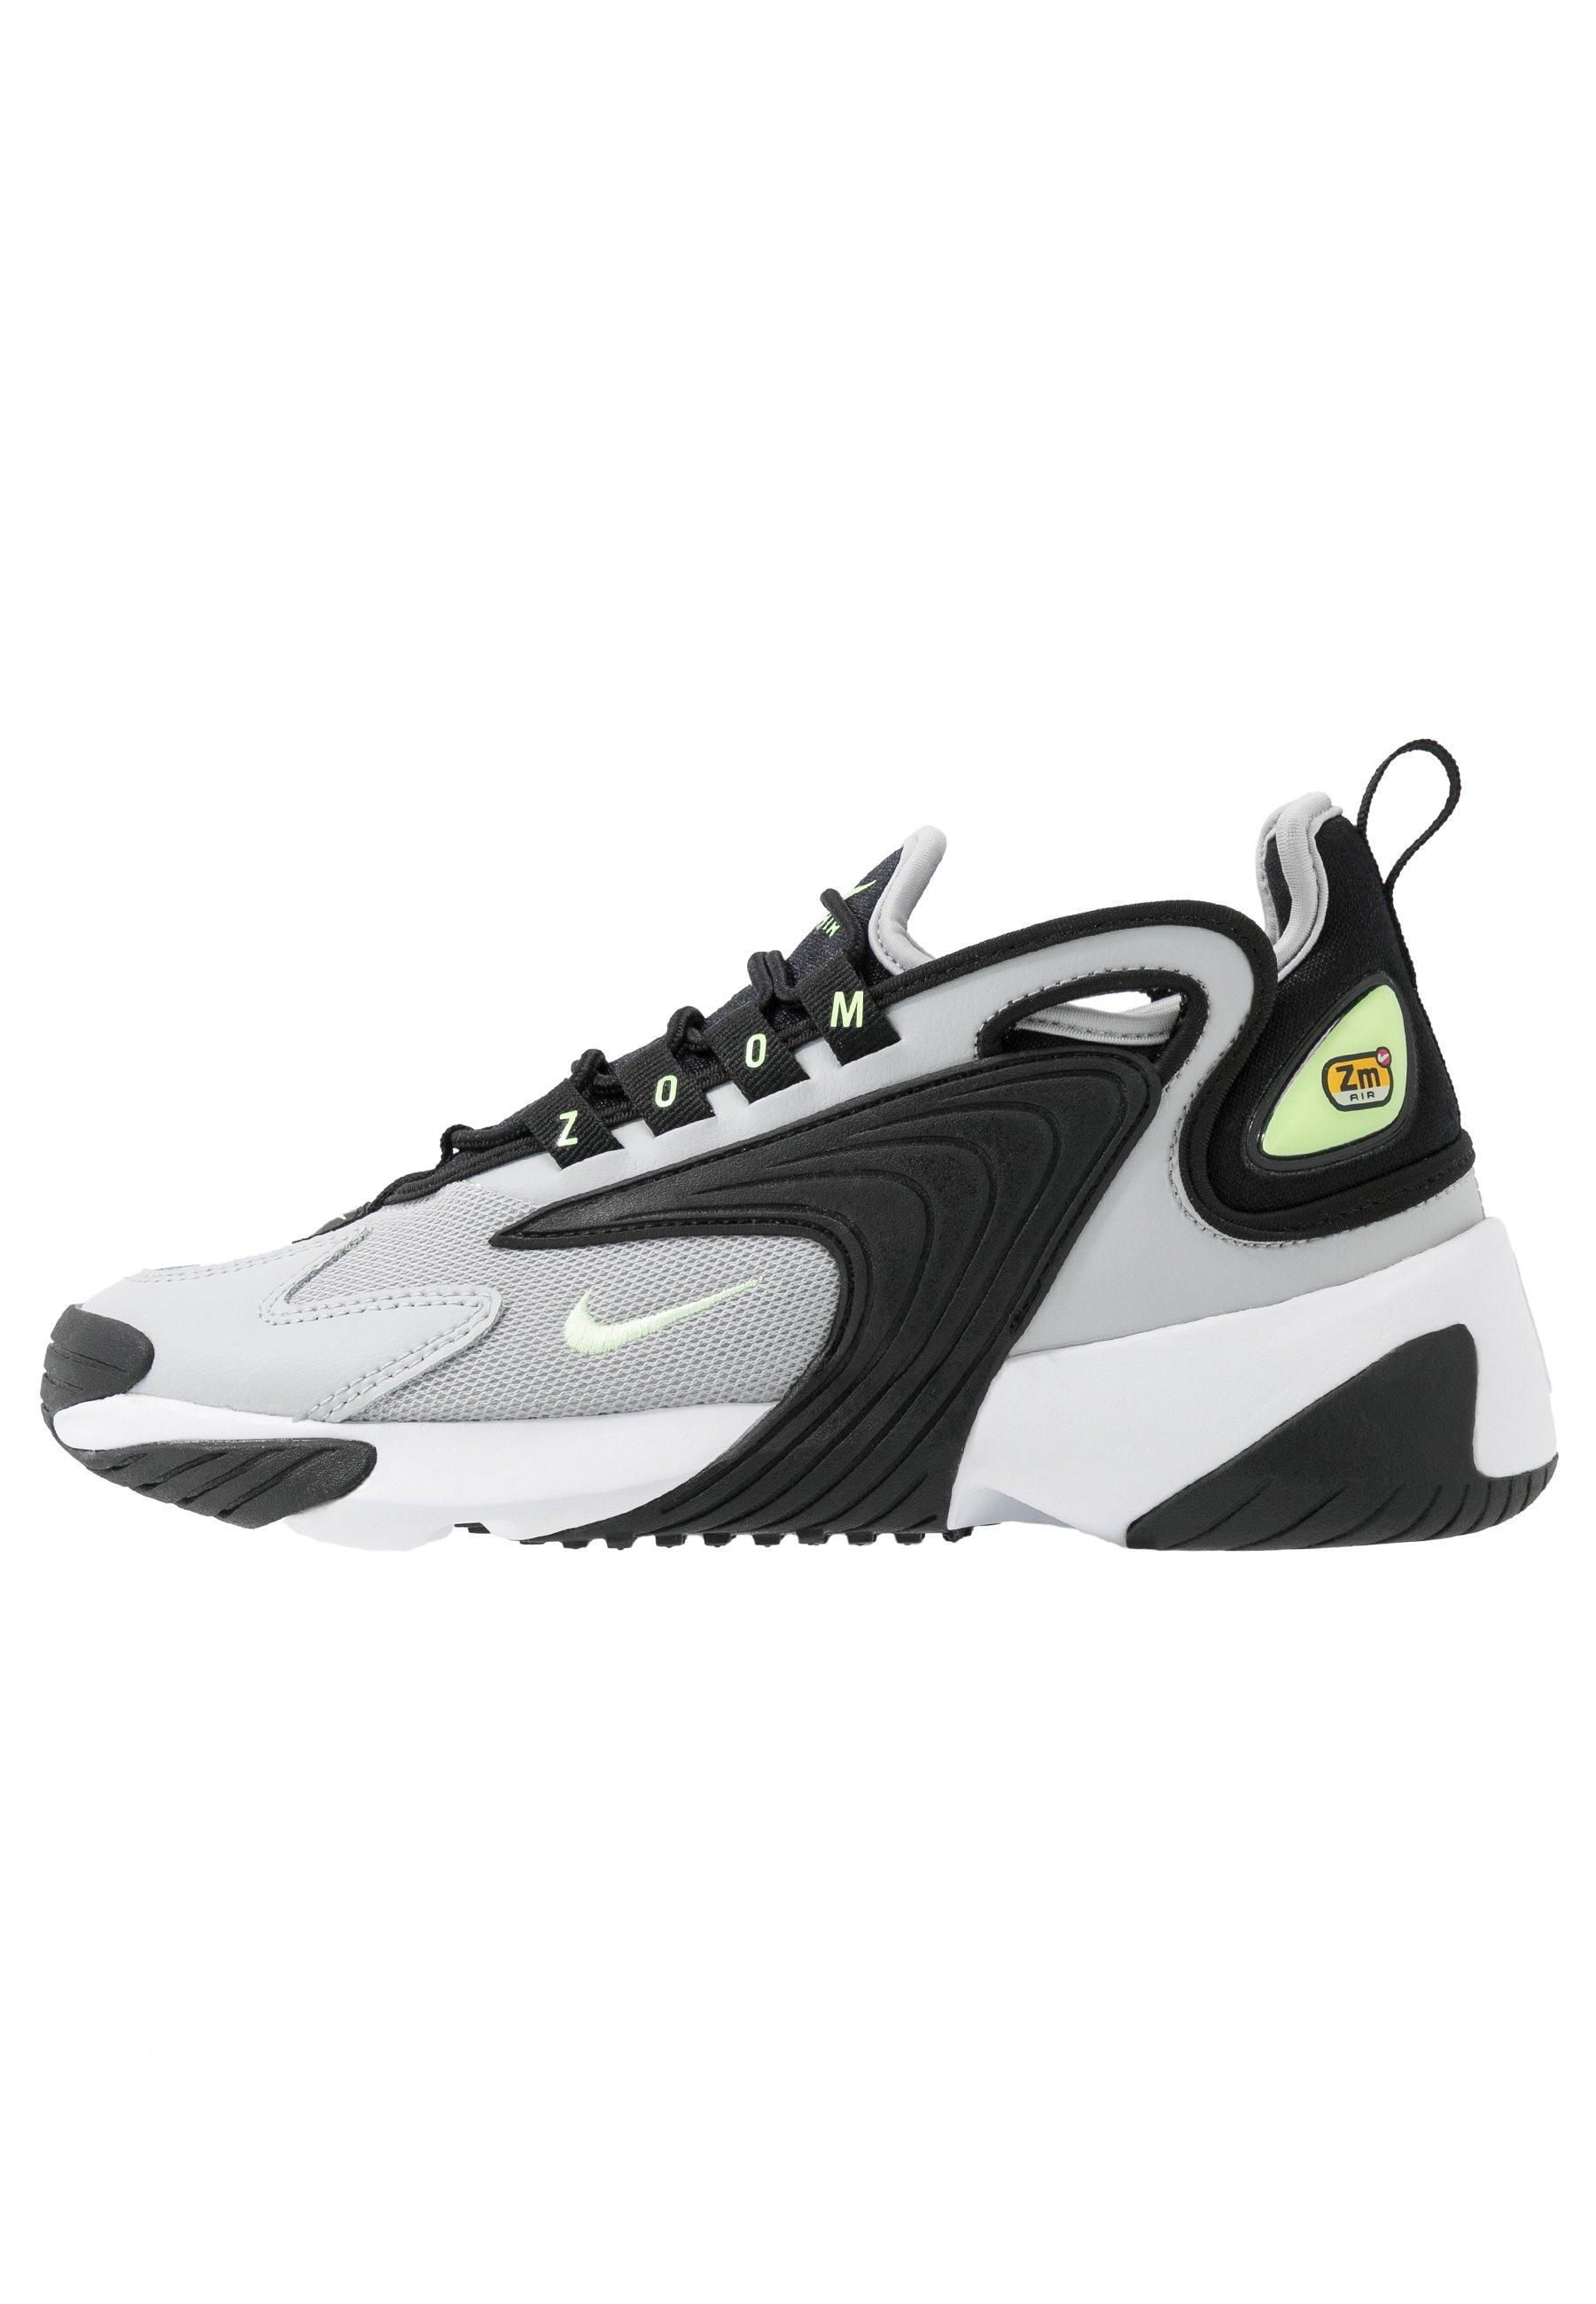 ZOOM 2K Sneakers basse blackbarely voltgrey fogwhite